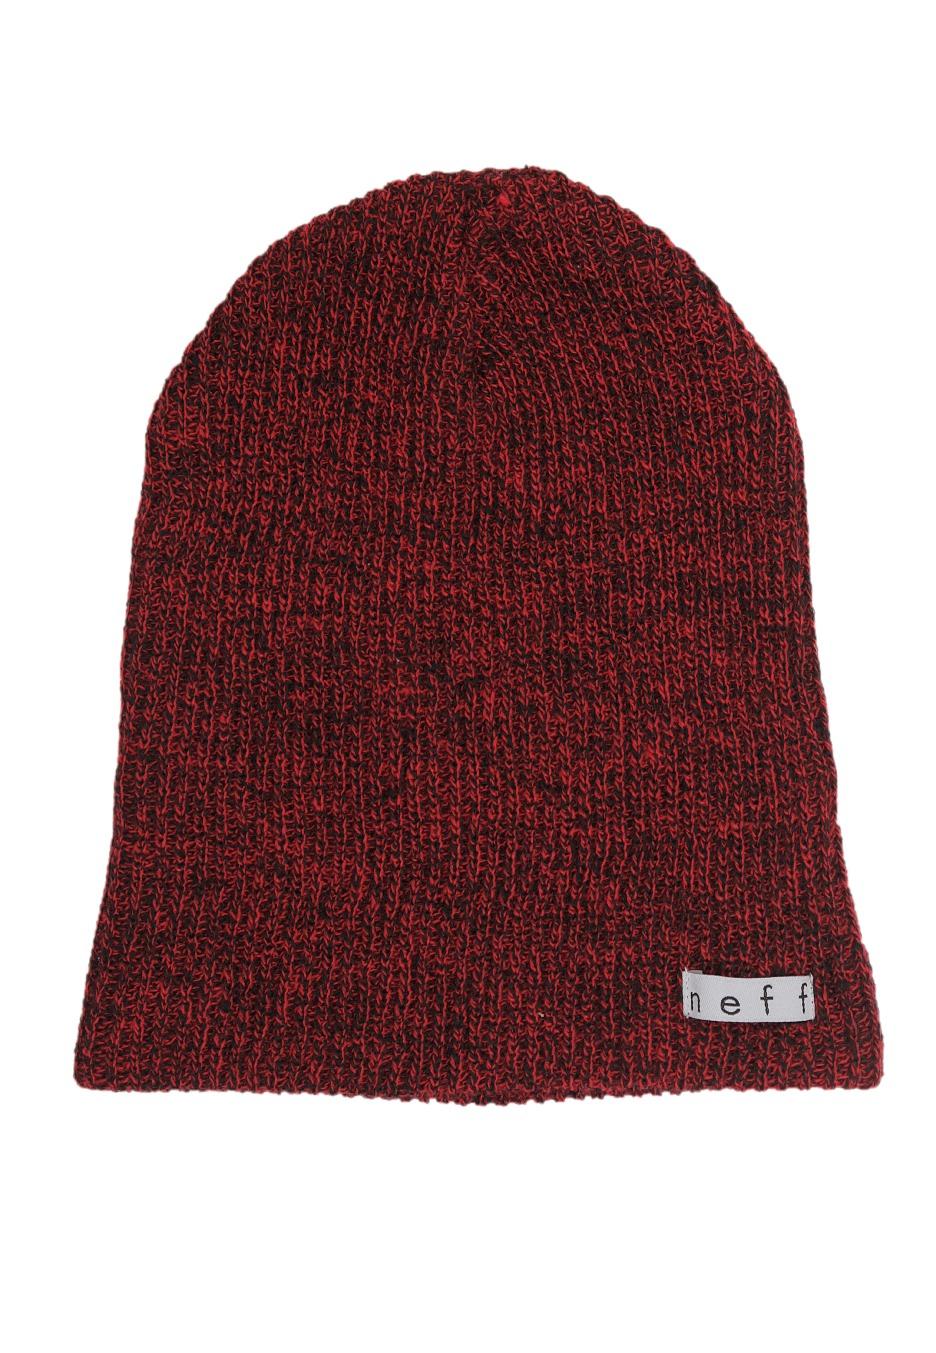 cf59c6e36ee Neff - Daily Heather Black Red - Beanie - Streetwear Shop - Impericon.com  Worldwide